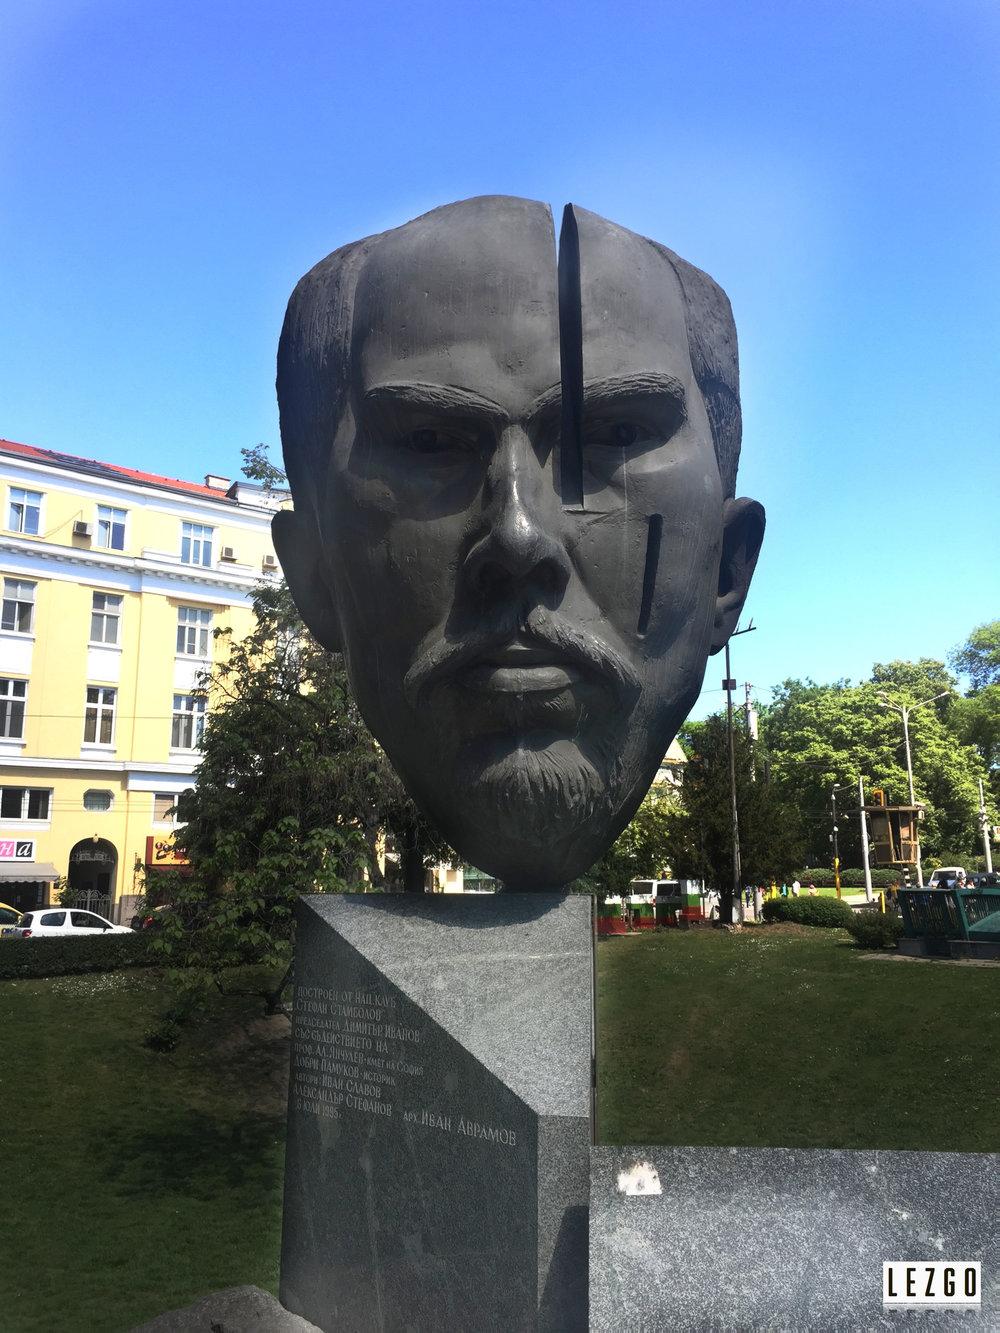 Sofia, Bulgaria April 2017